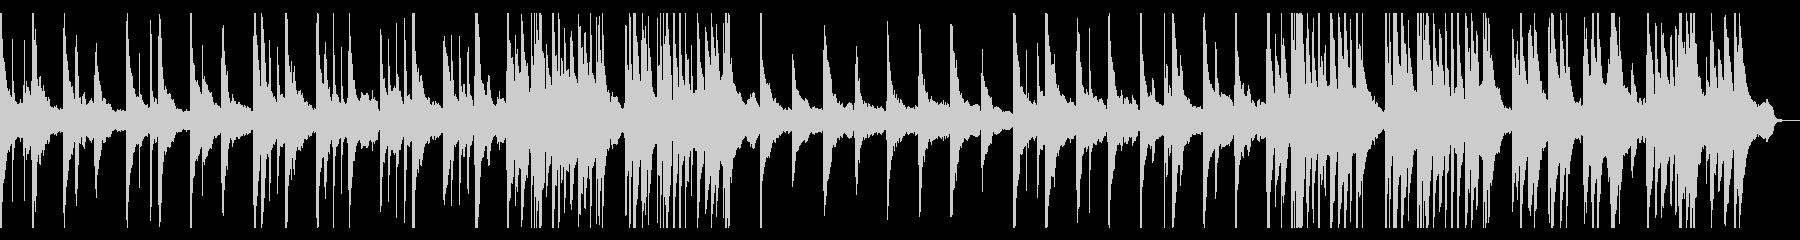 memory. R & B_4's unreproduced waveform